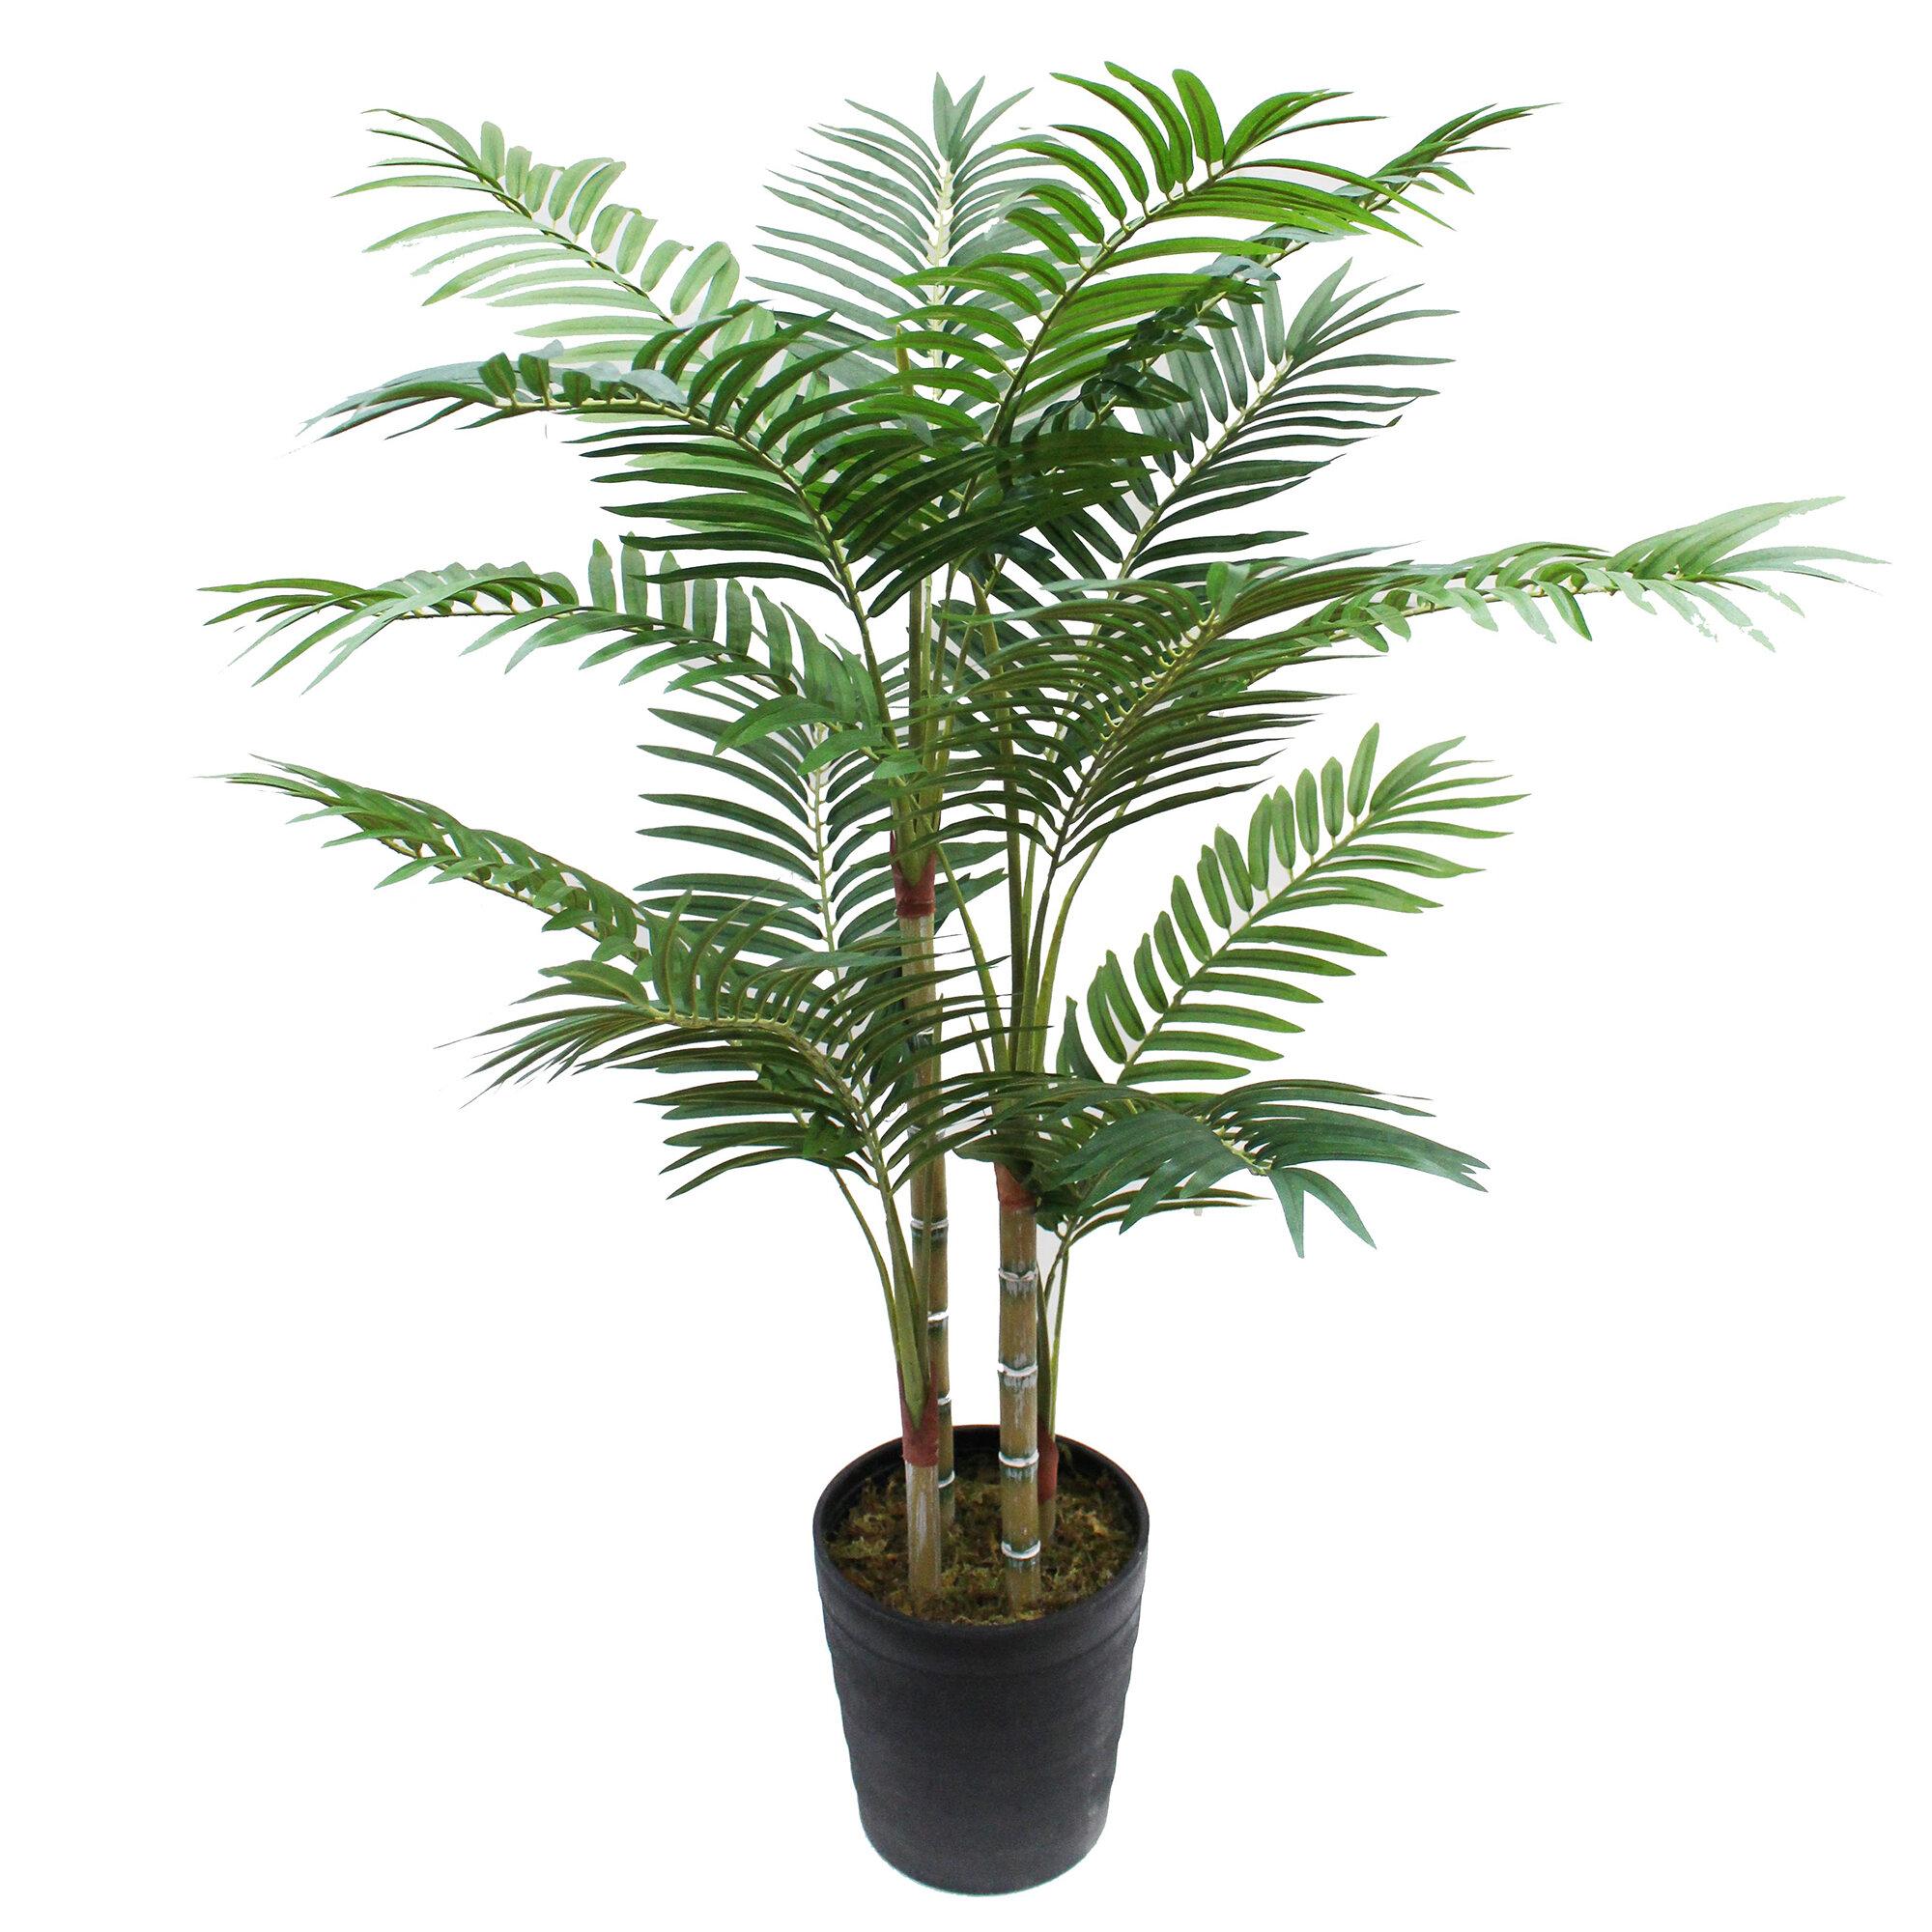 Bayou Breeze 41 Artificial Palm Tree In Pot Reviews Wayfair